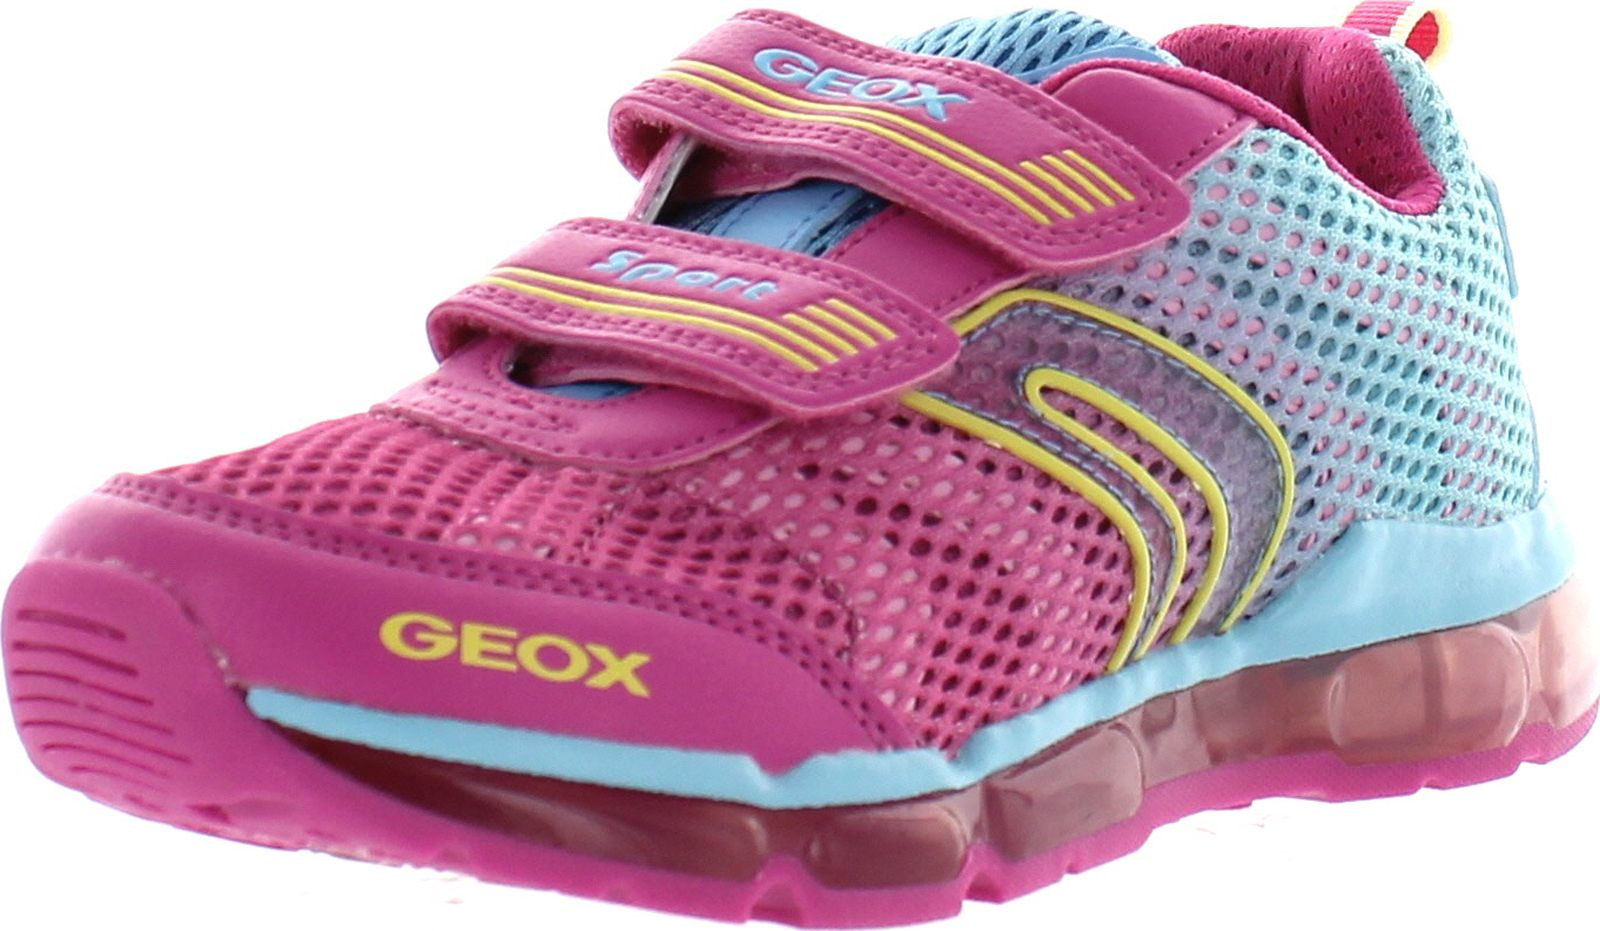 Janice Júnior Complicado  Geox - GEOX Girls Jr Android Girl Fashion Sneakers - Walmart.com -  Walmart.com